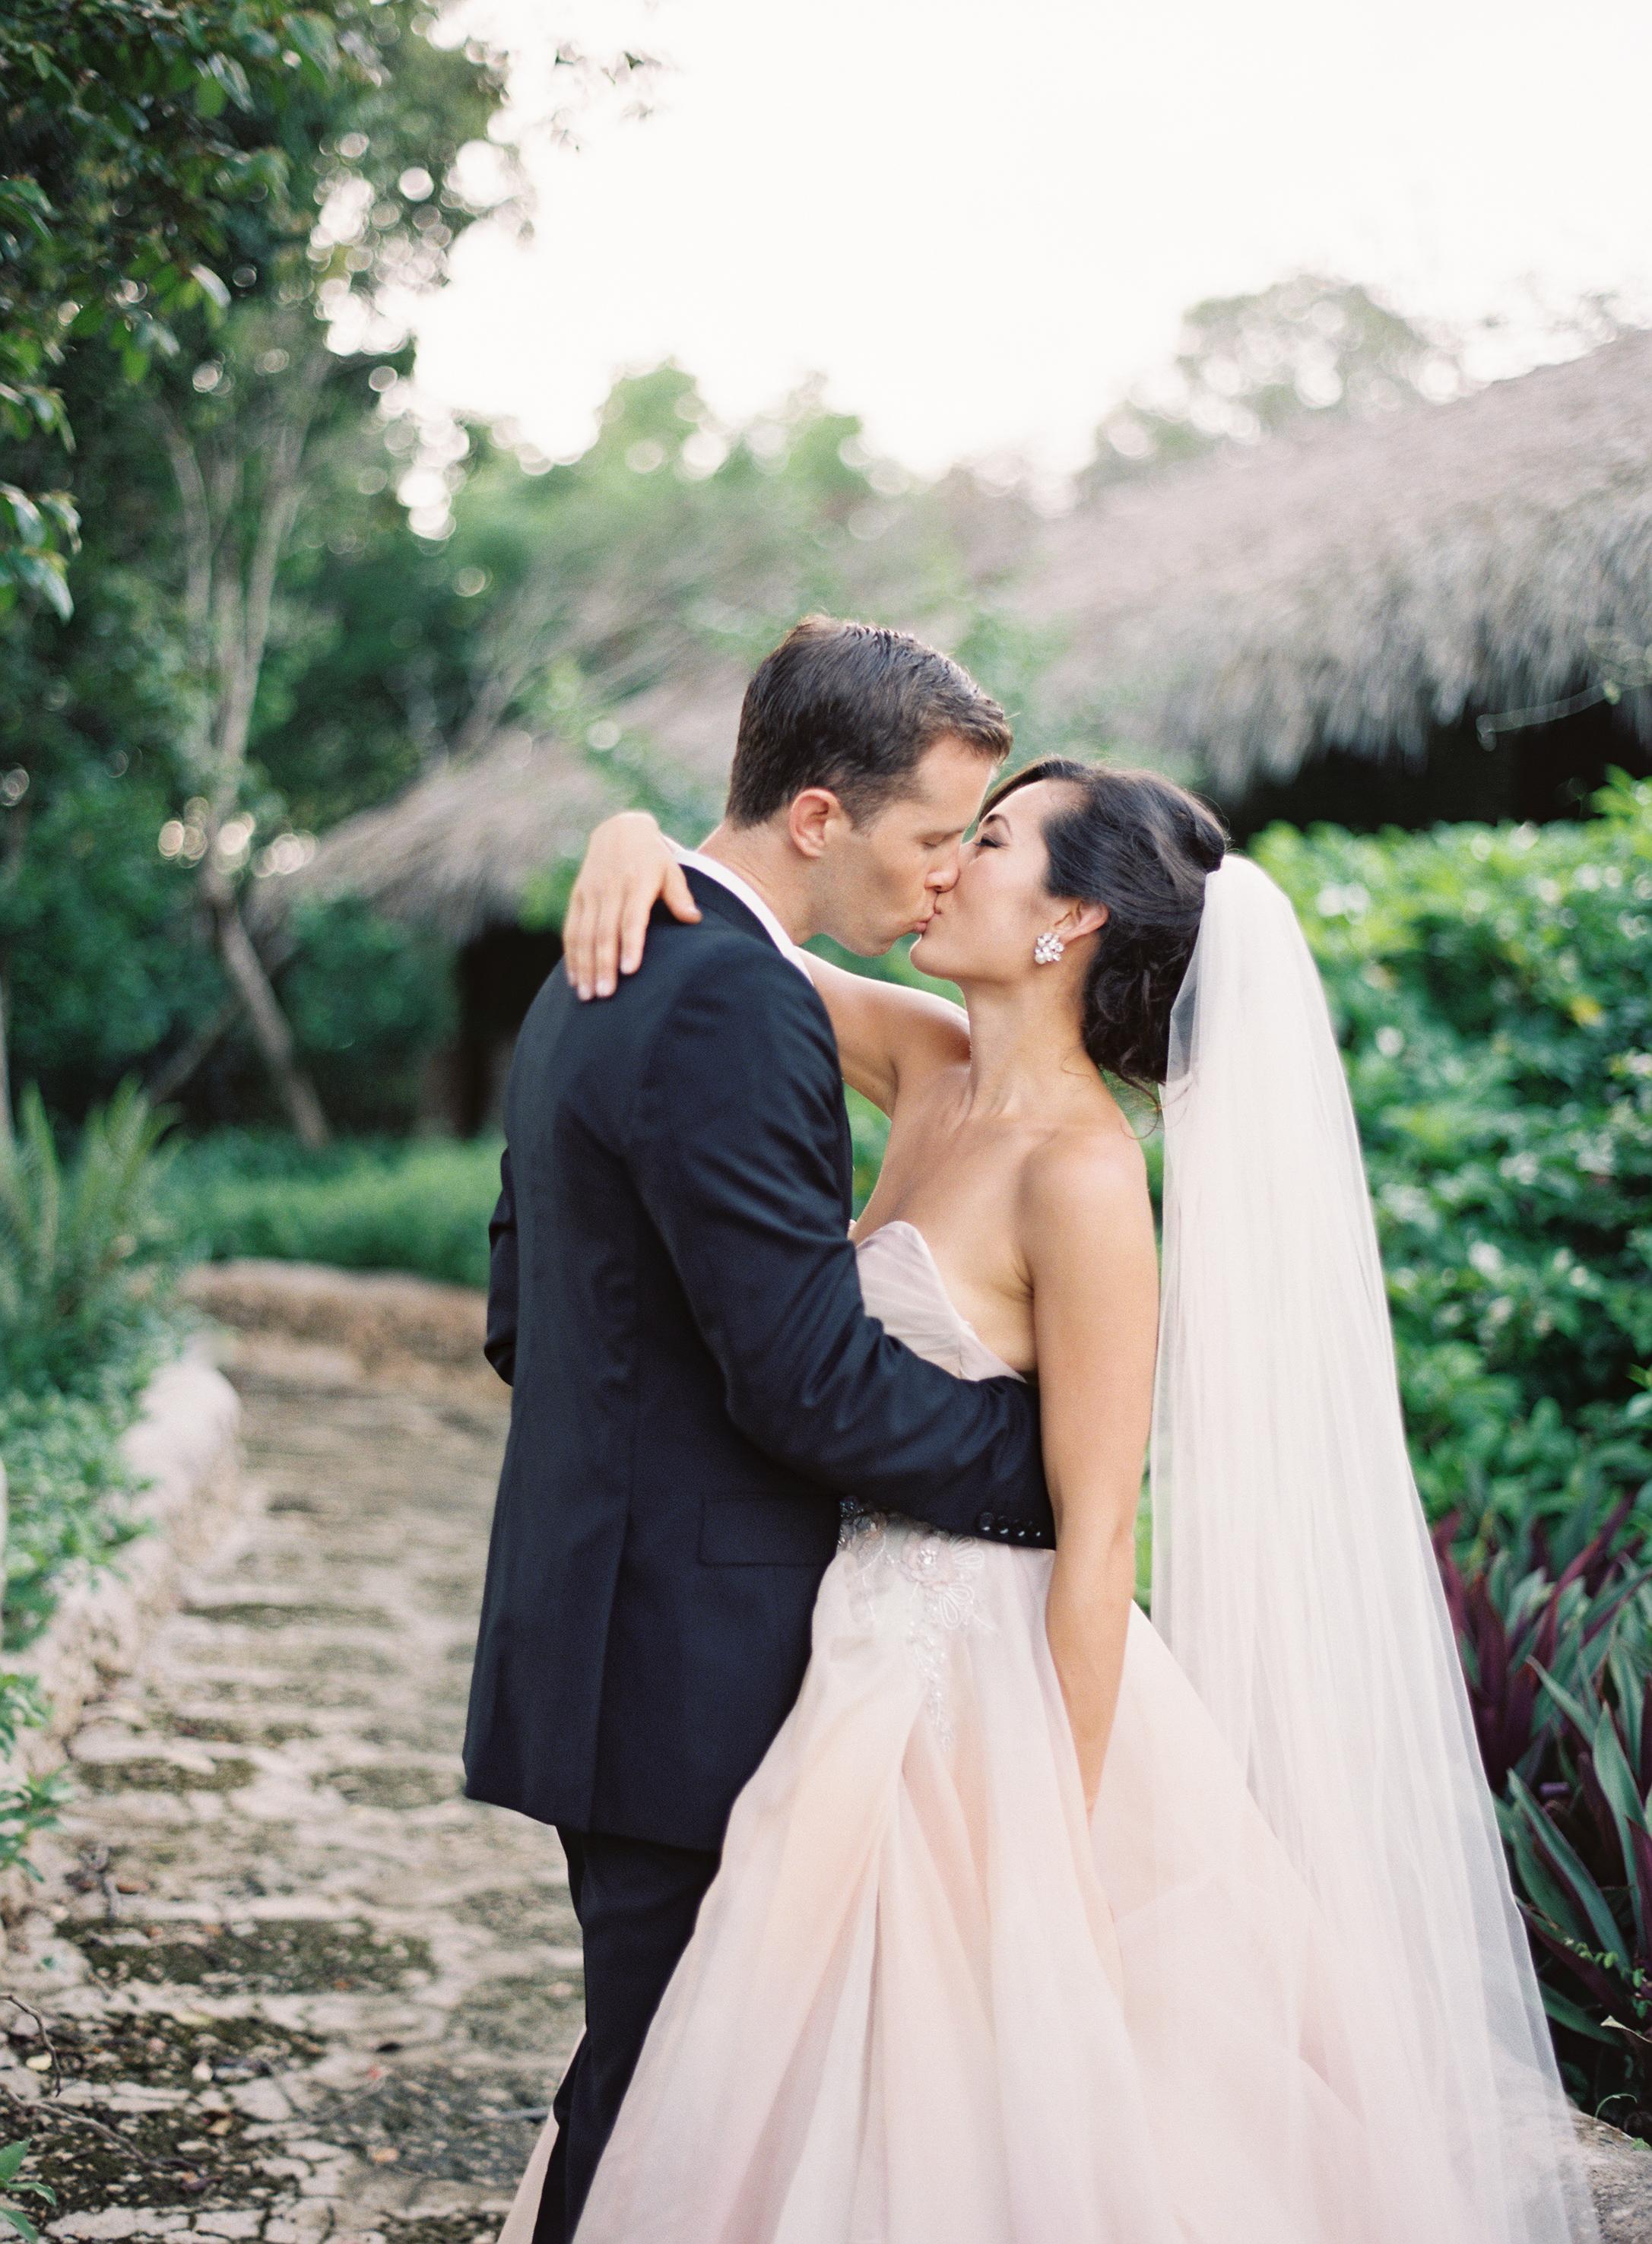 Ashleigh and Brian-Wedding Day-Carrie King Photographer-501.jpg